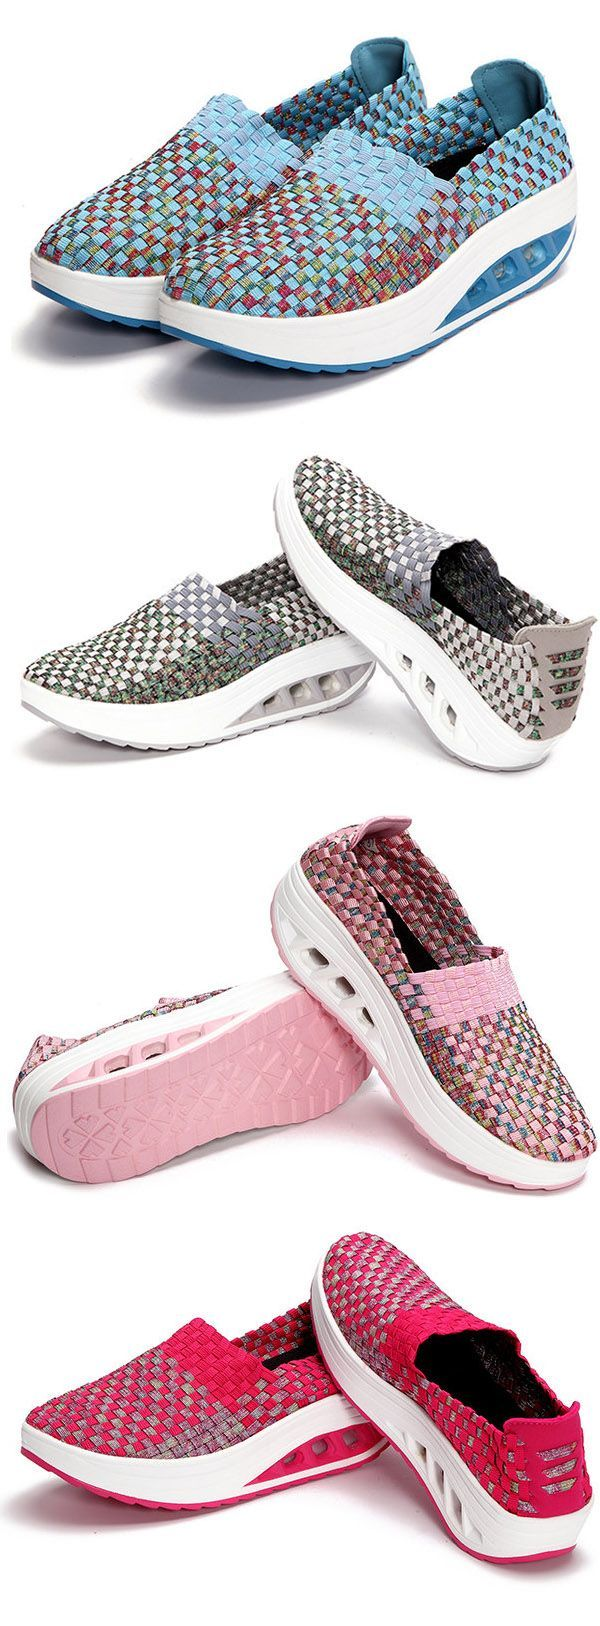 $24.40 Platform Color Match Casual Rocker Sole Sport Slip On Shoes,sport shoes women,sport shoes outfit,sport shoes fashion,running sport shoes